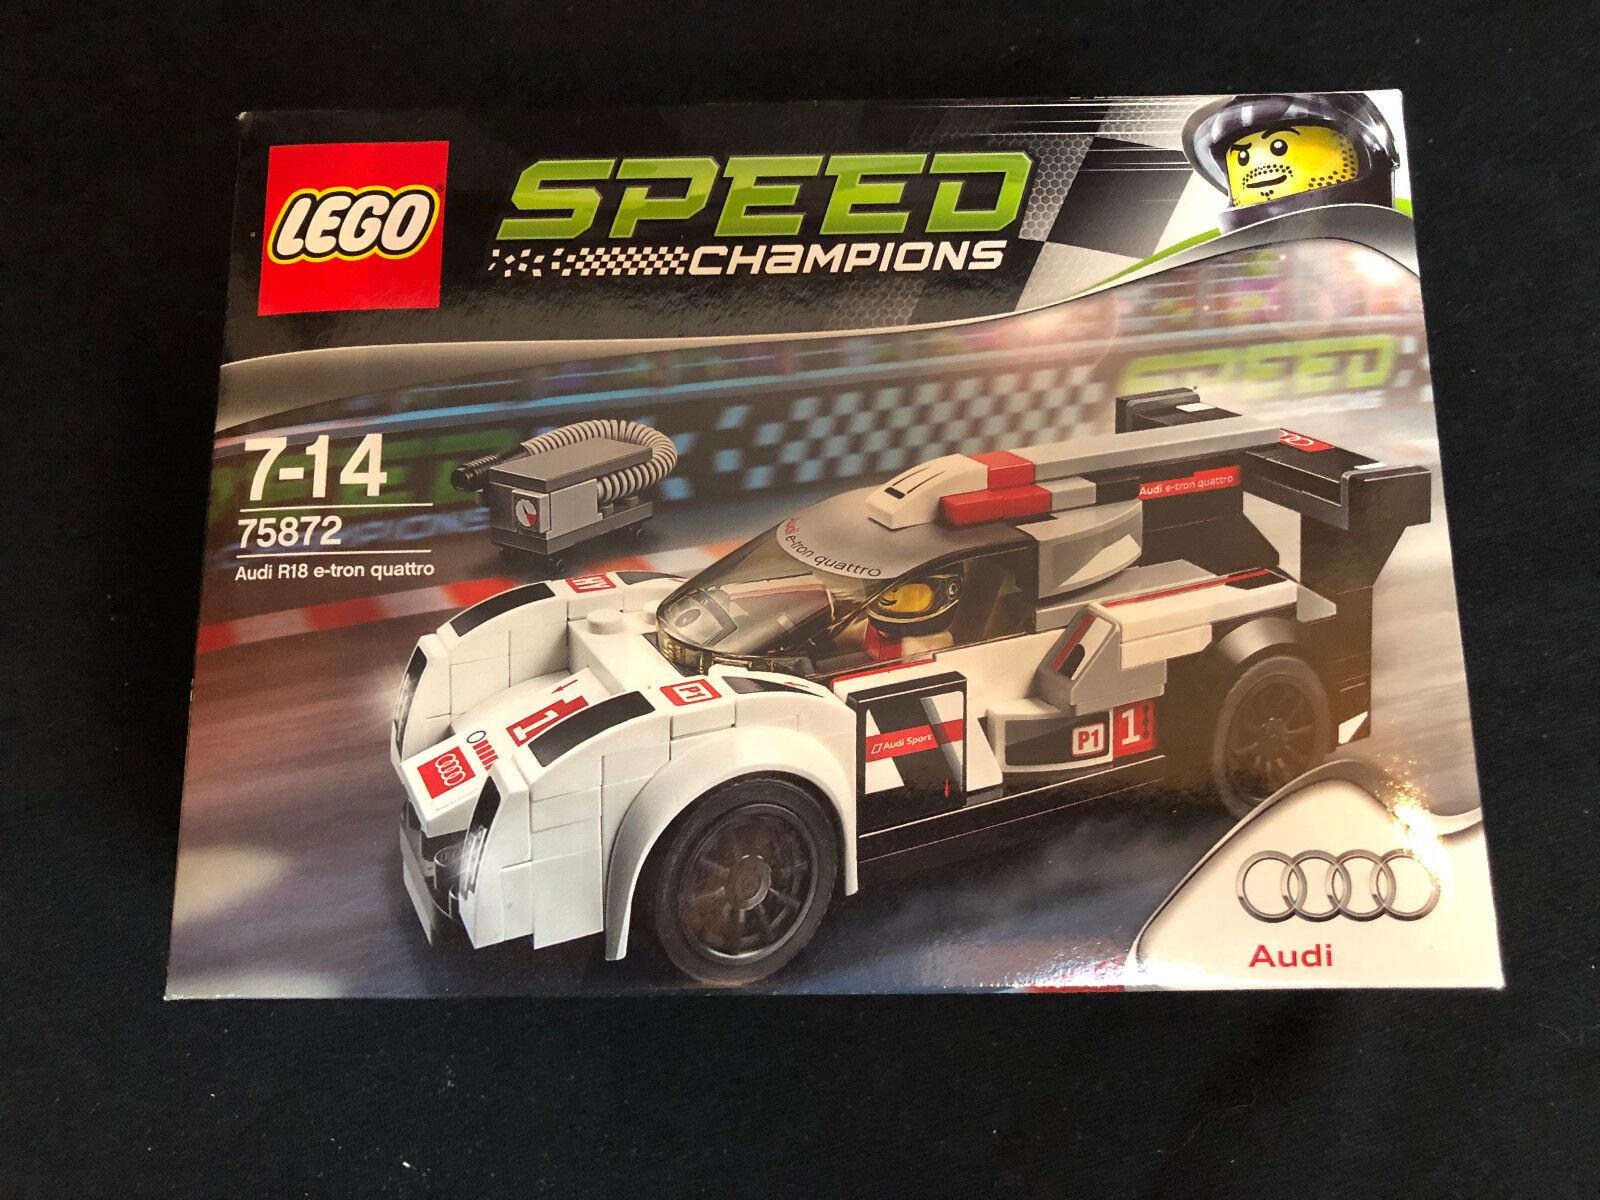 Lego 75872 Speed Champions Audi R18 e-tron quattro Serie 2 Neu New OVP MISB